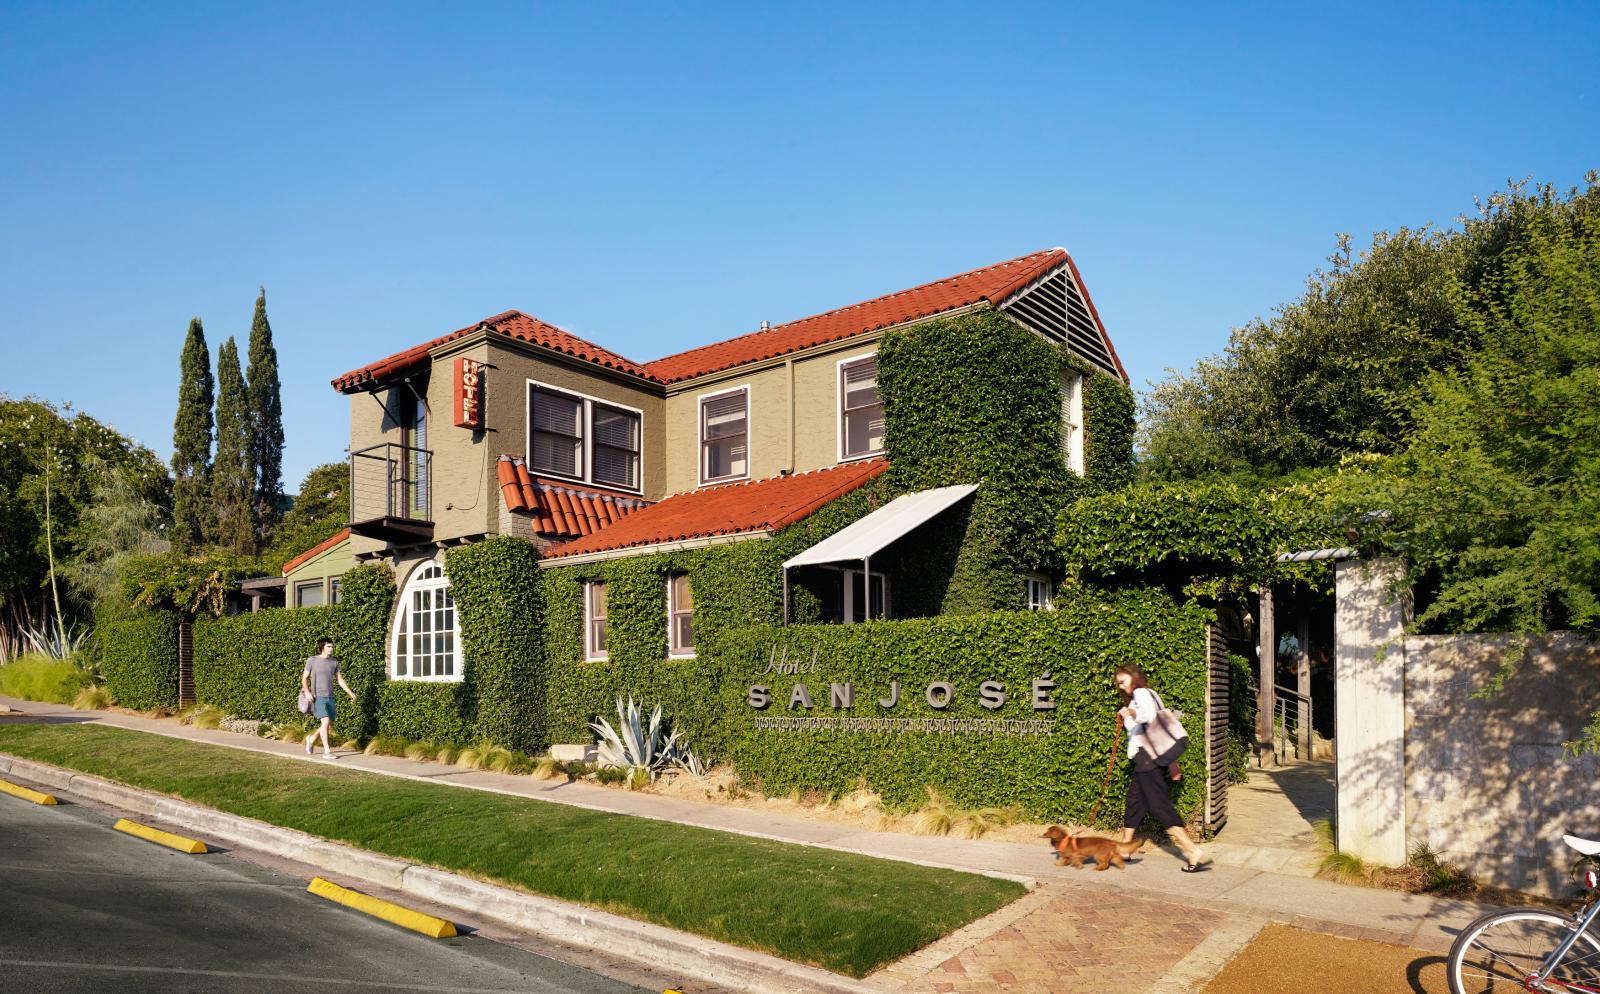 Hotel San José in Austin